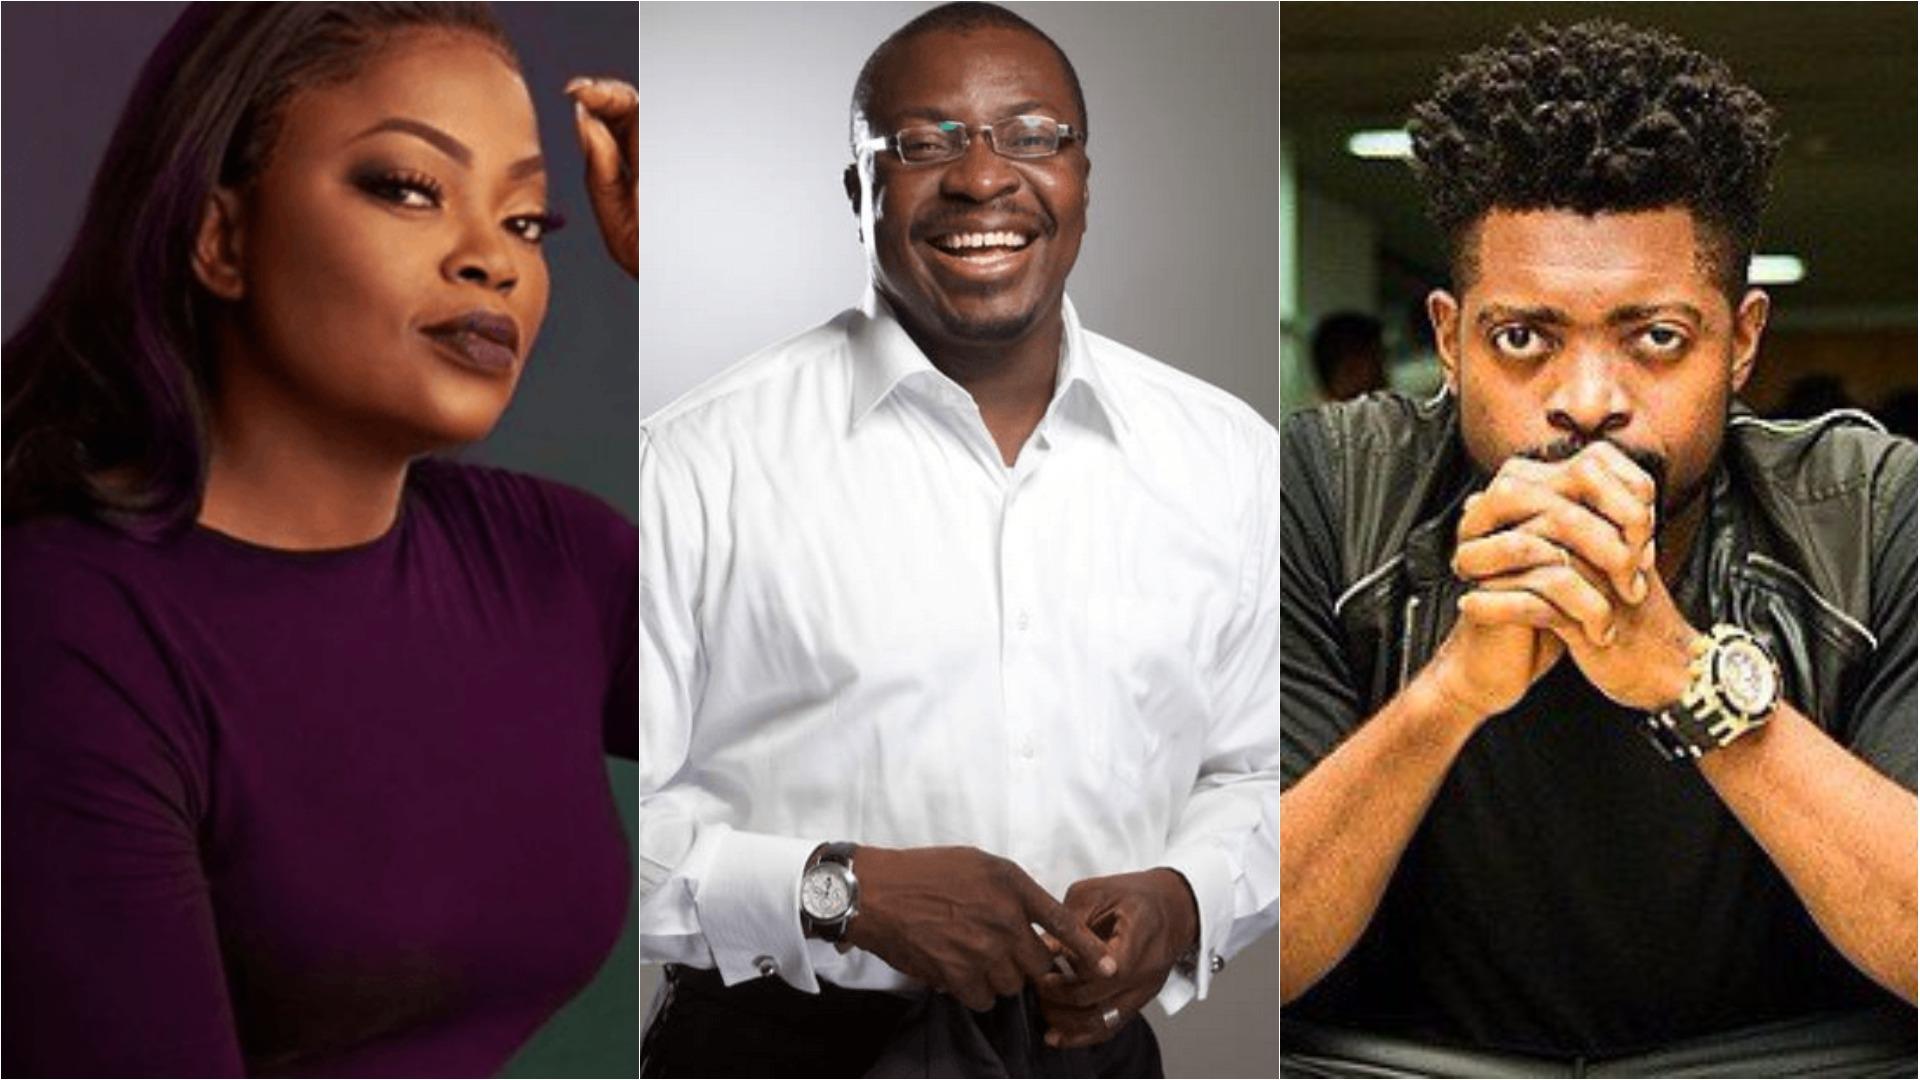 Basketmouth, Ali Baba, Funke Akindele, Gbenga Adeyinka, 46 others to perform at Lagos Laughs comedy show